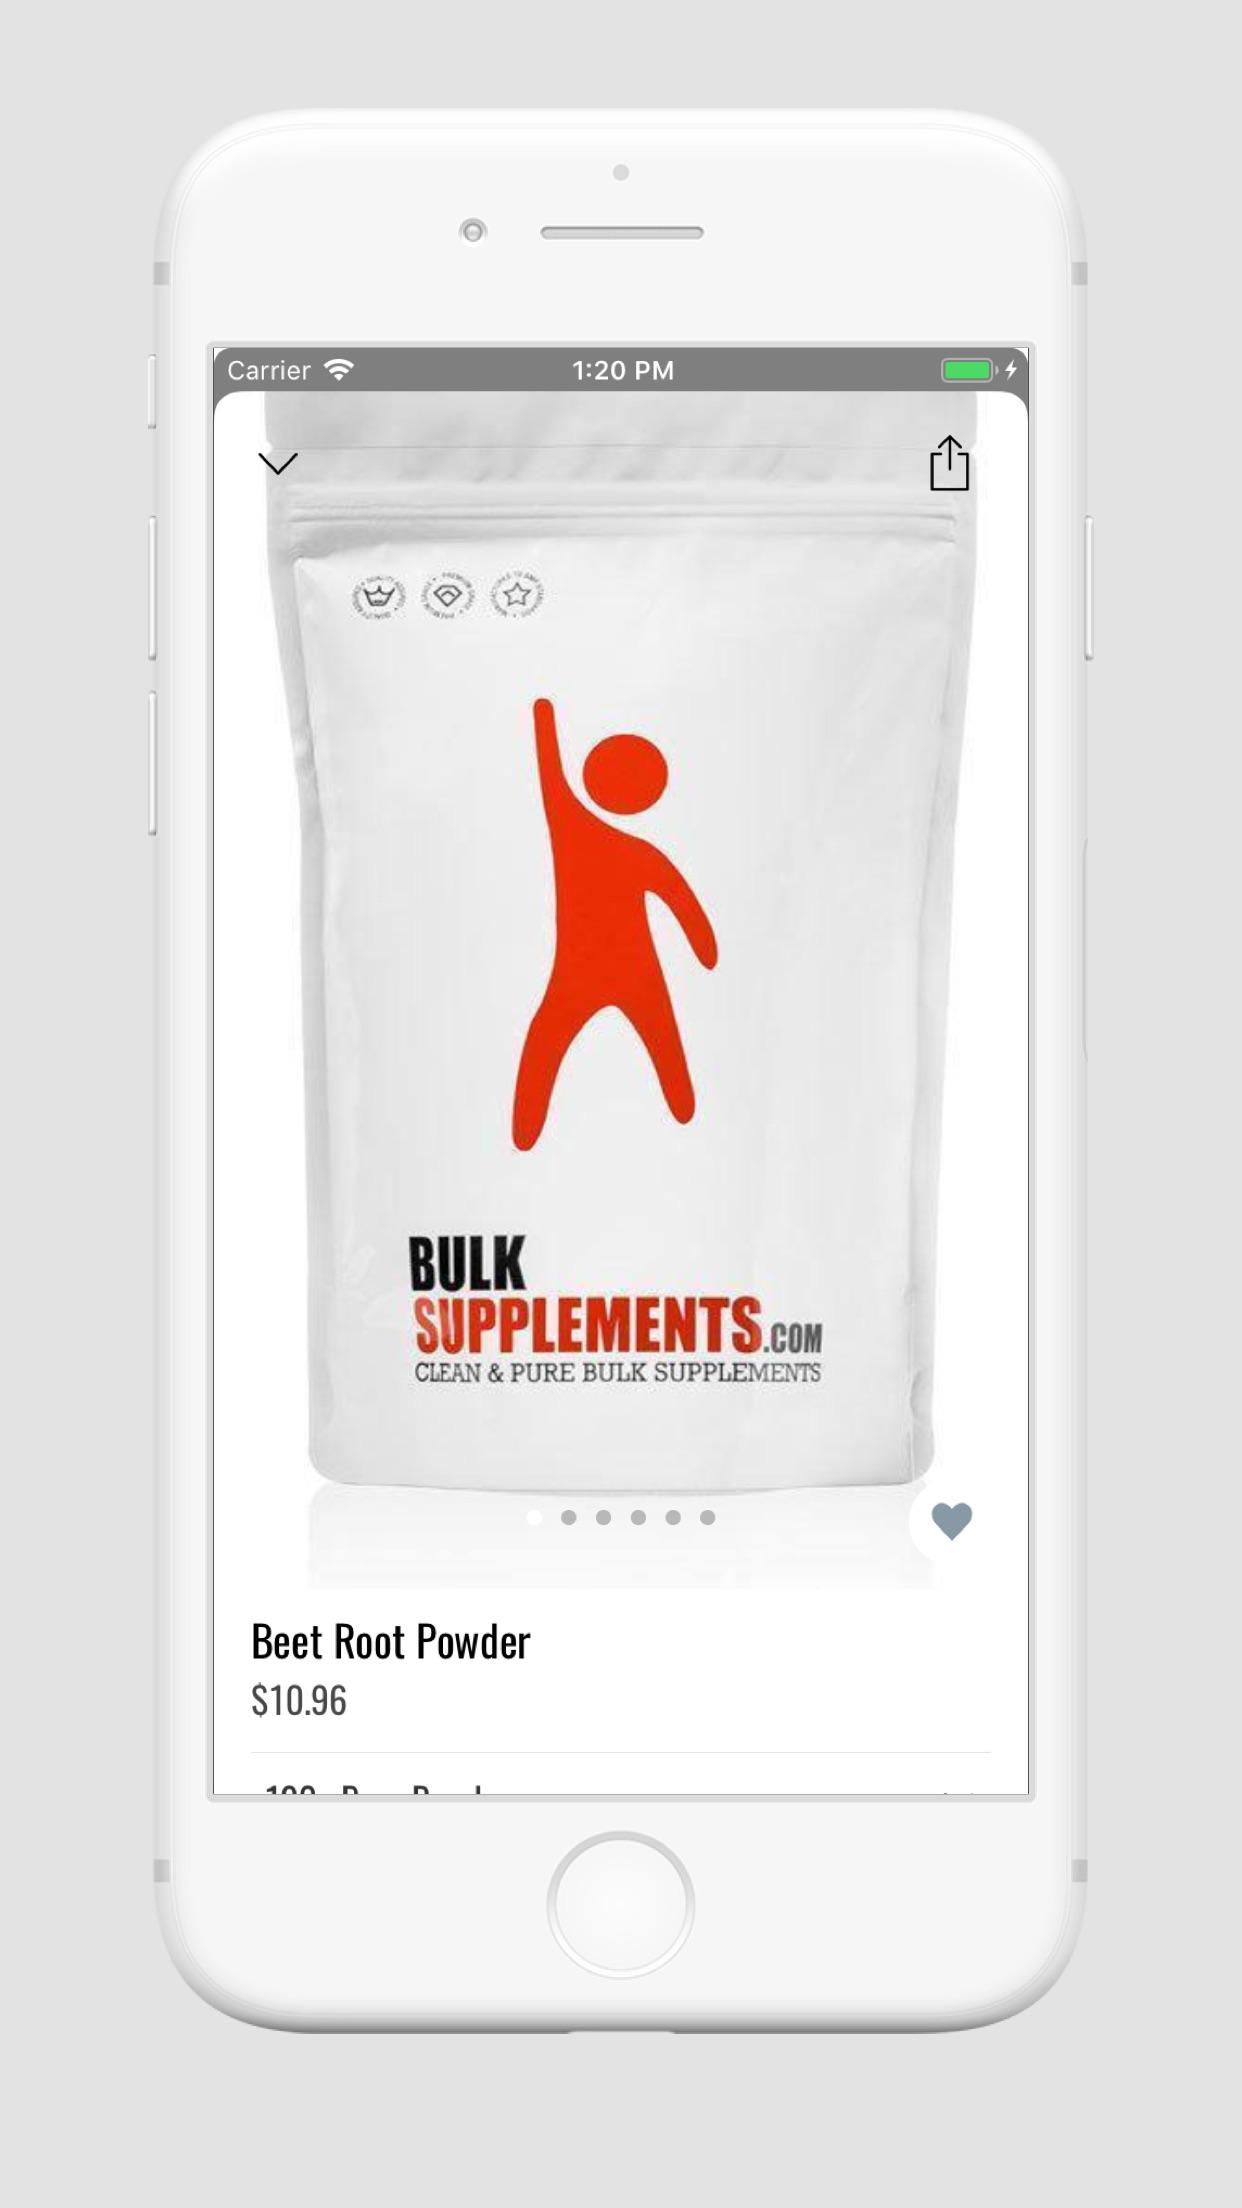 Bulk Supplements: Vitamin Shop Screenshot